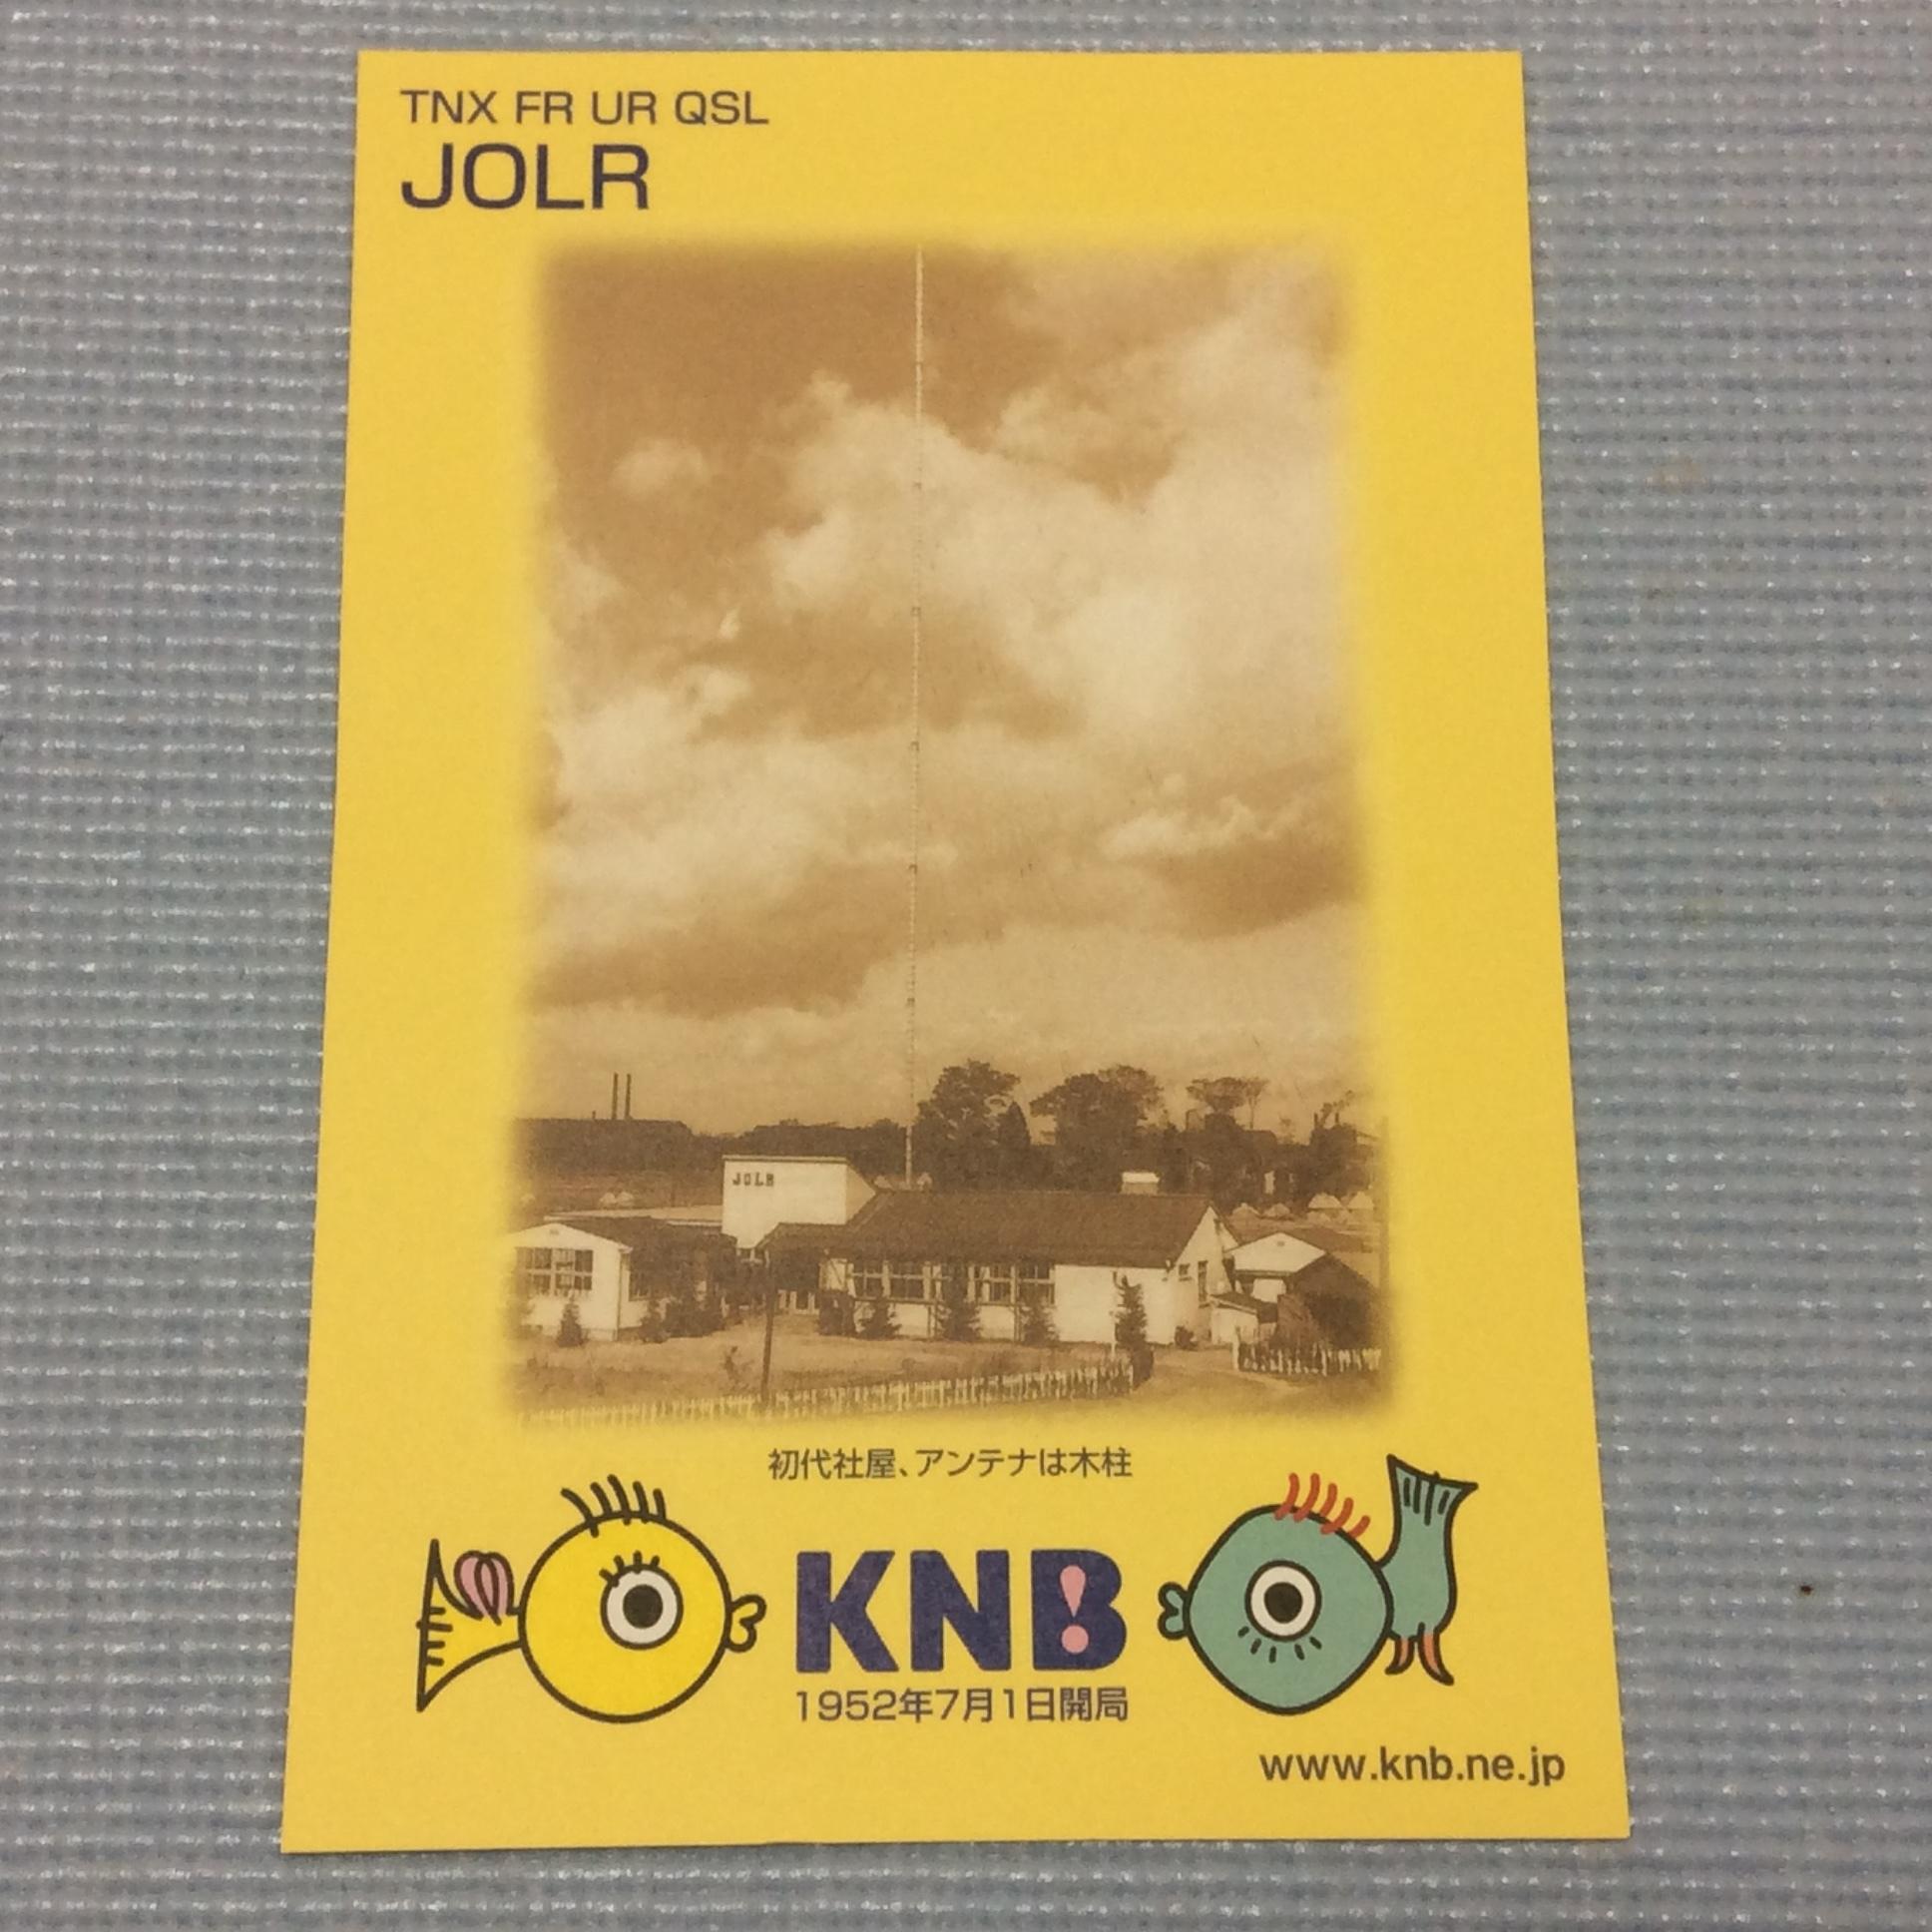 knb radio verification card